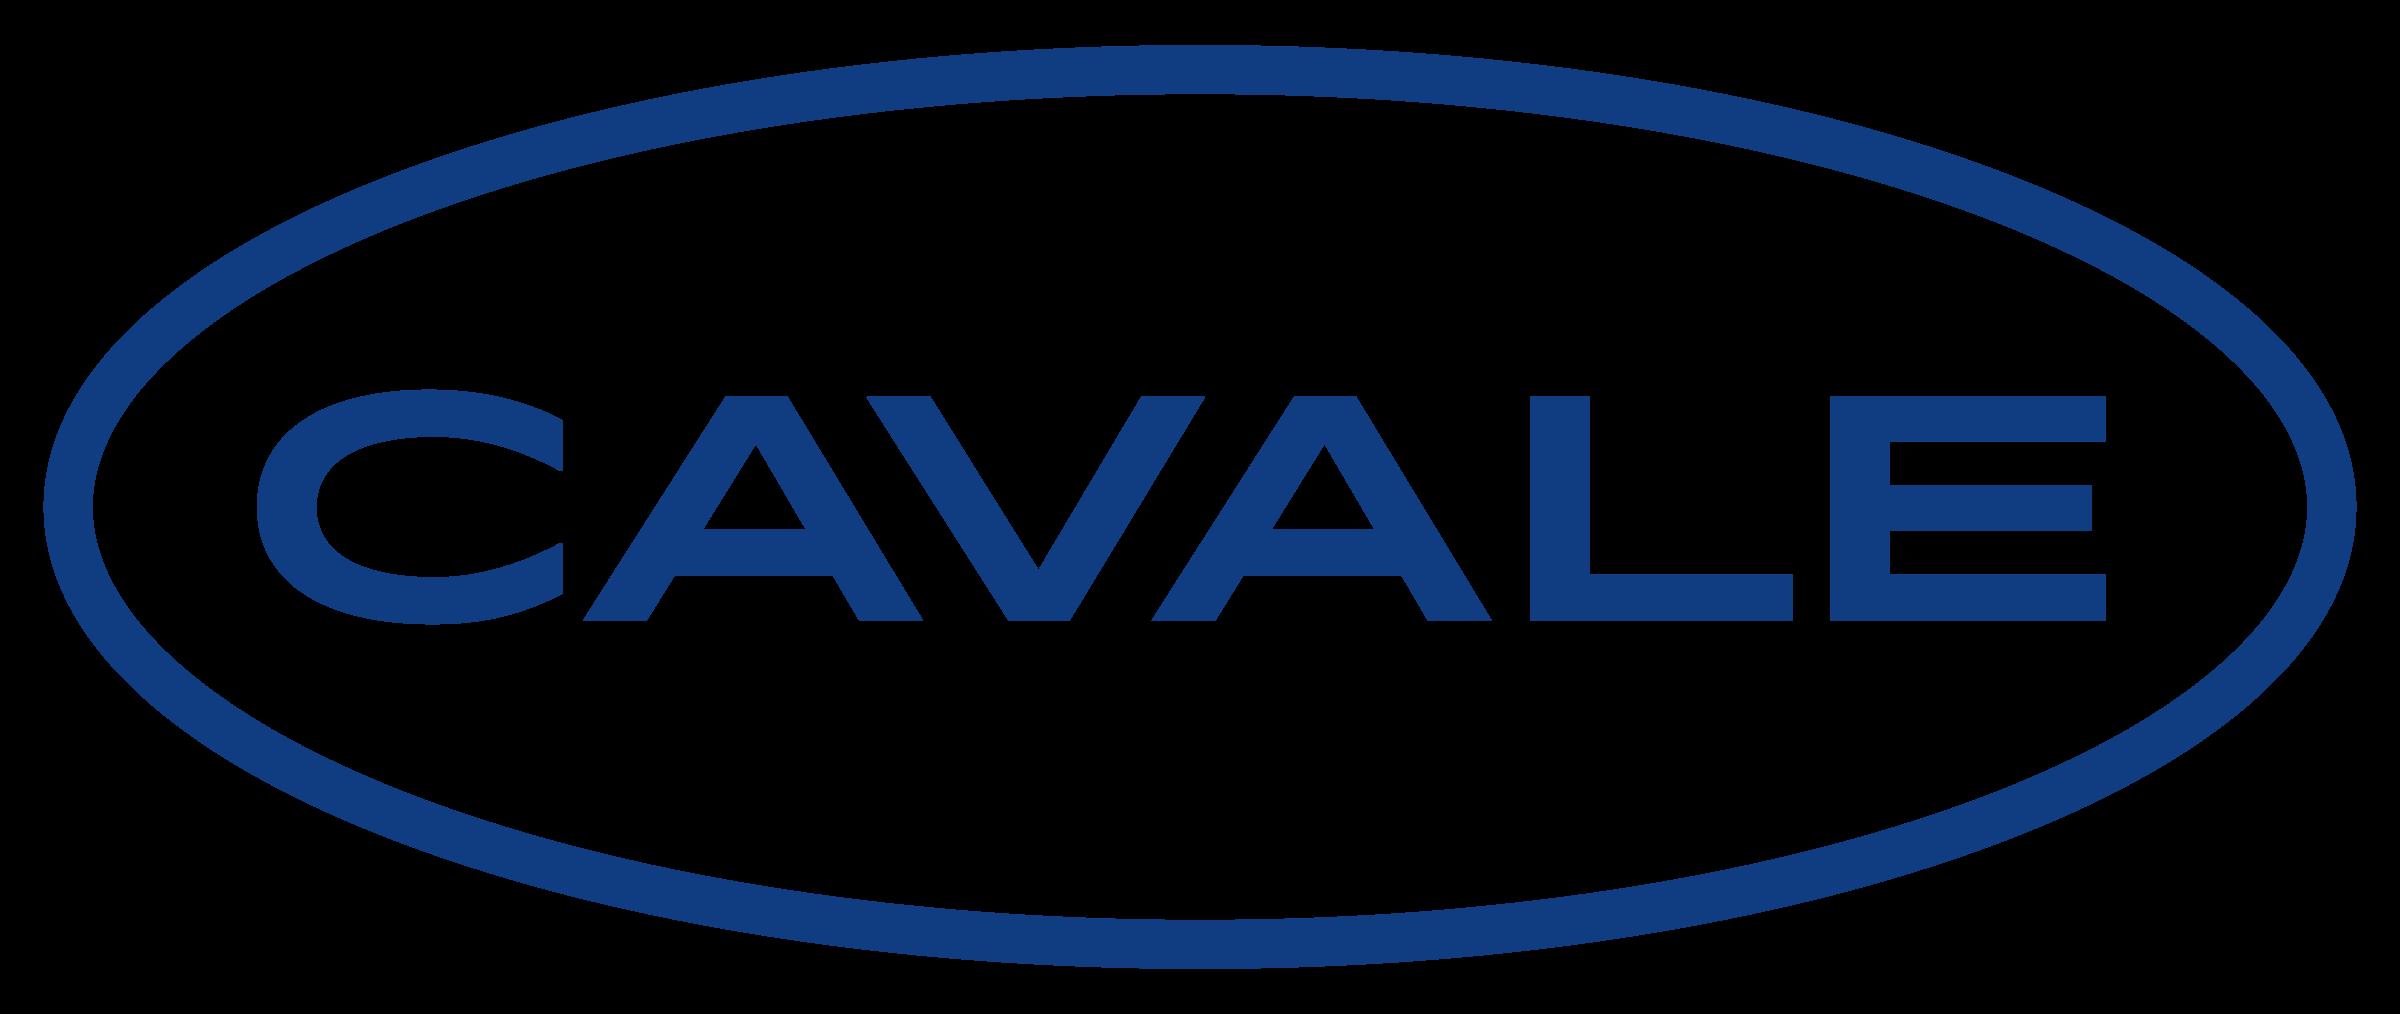 Cavale logo png